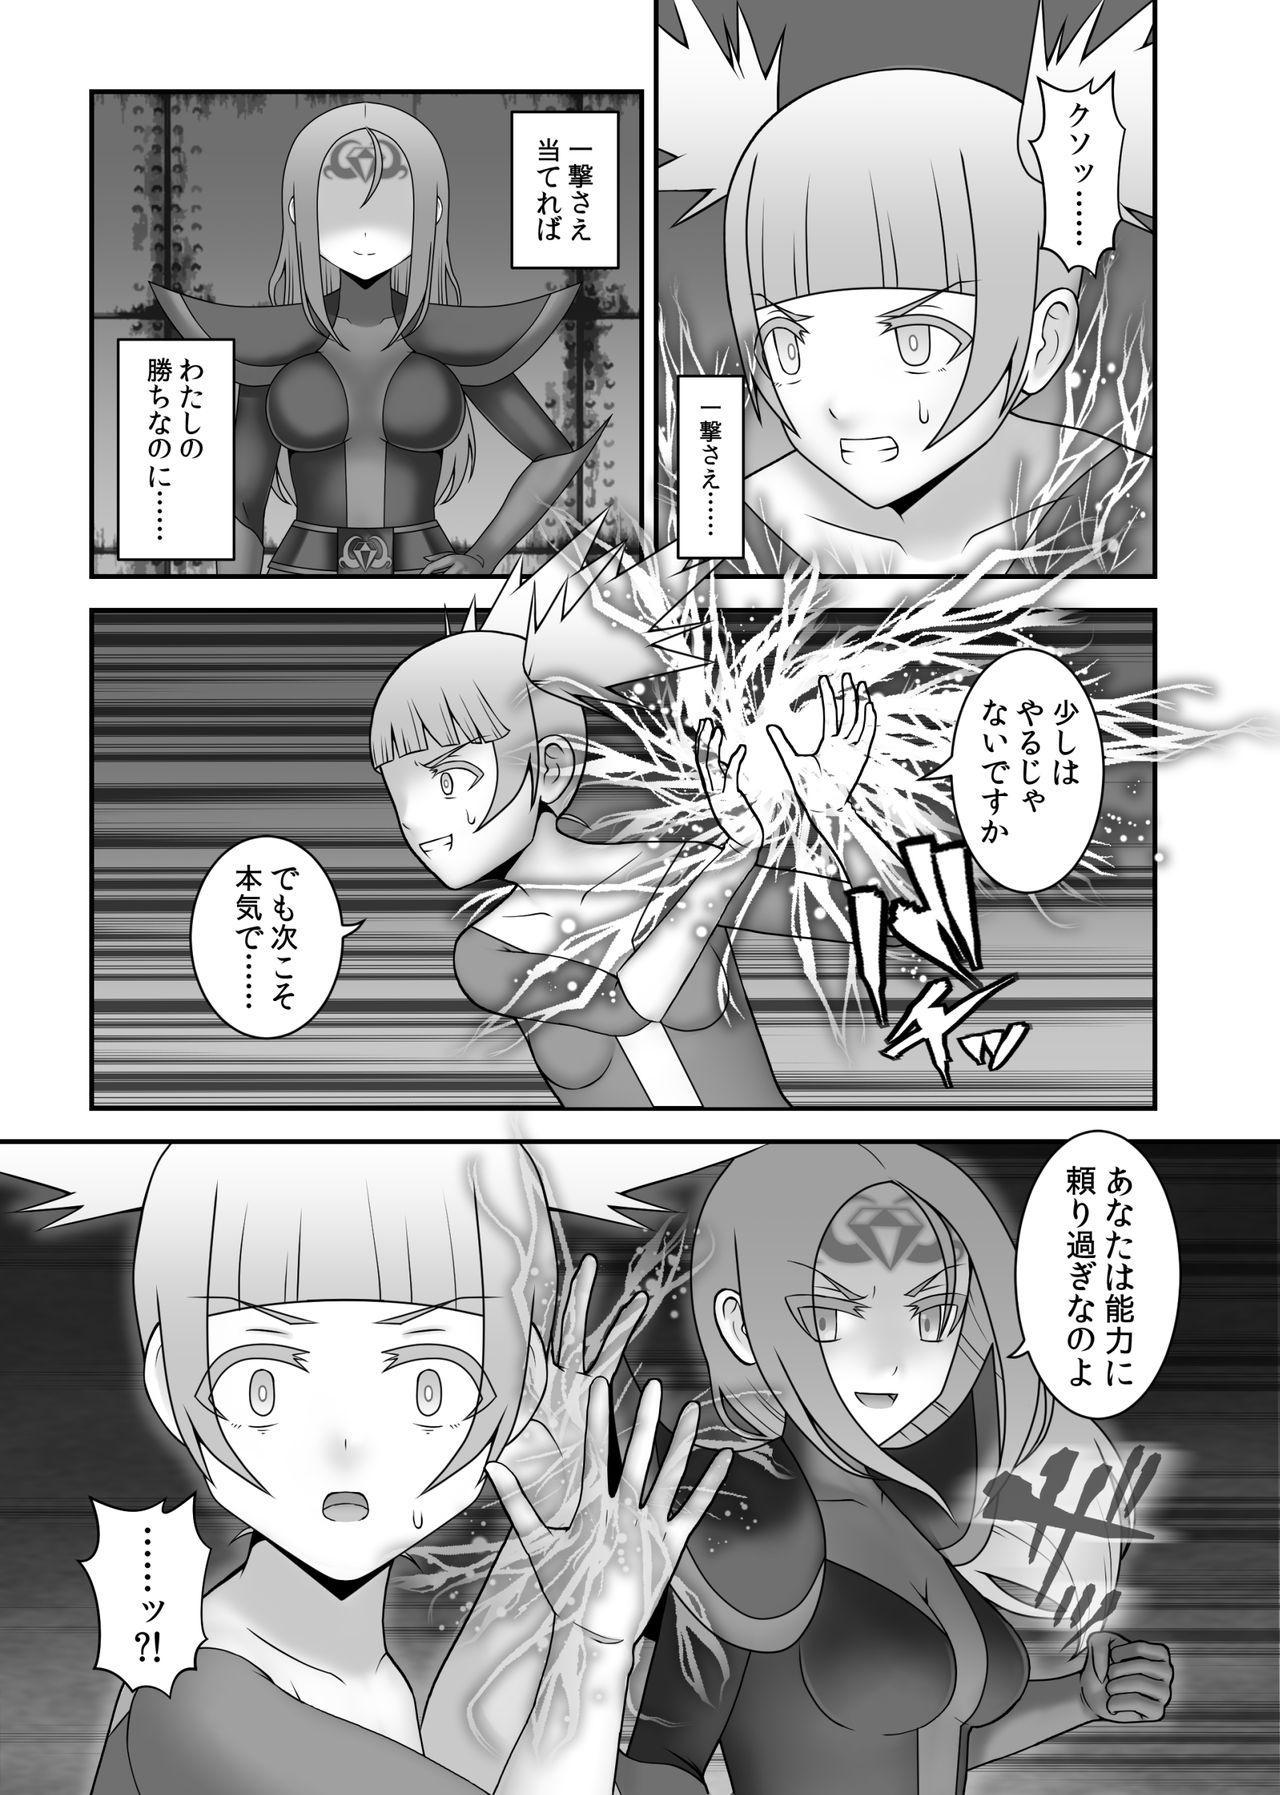 [STUDIO HP+ (IceLee)] Teisou Sentai Virginal Colors Dai-Go-wa 11